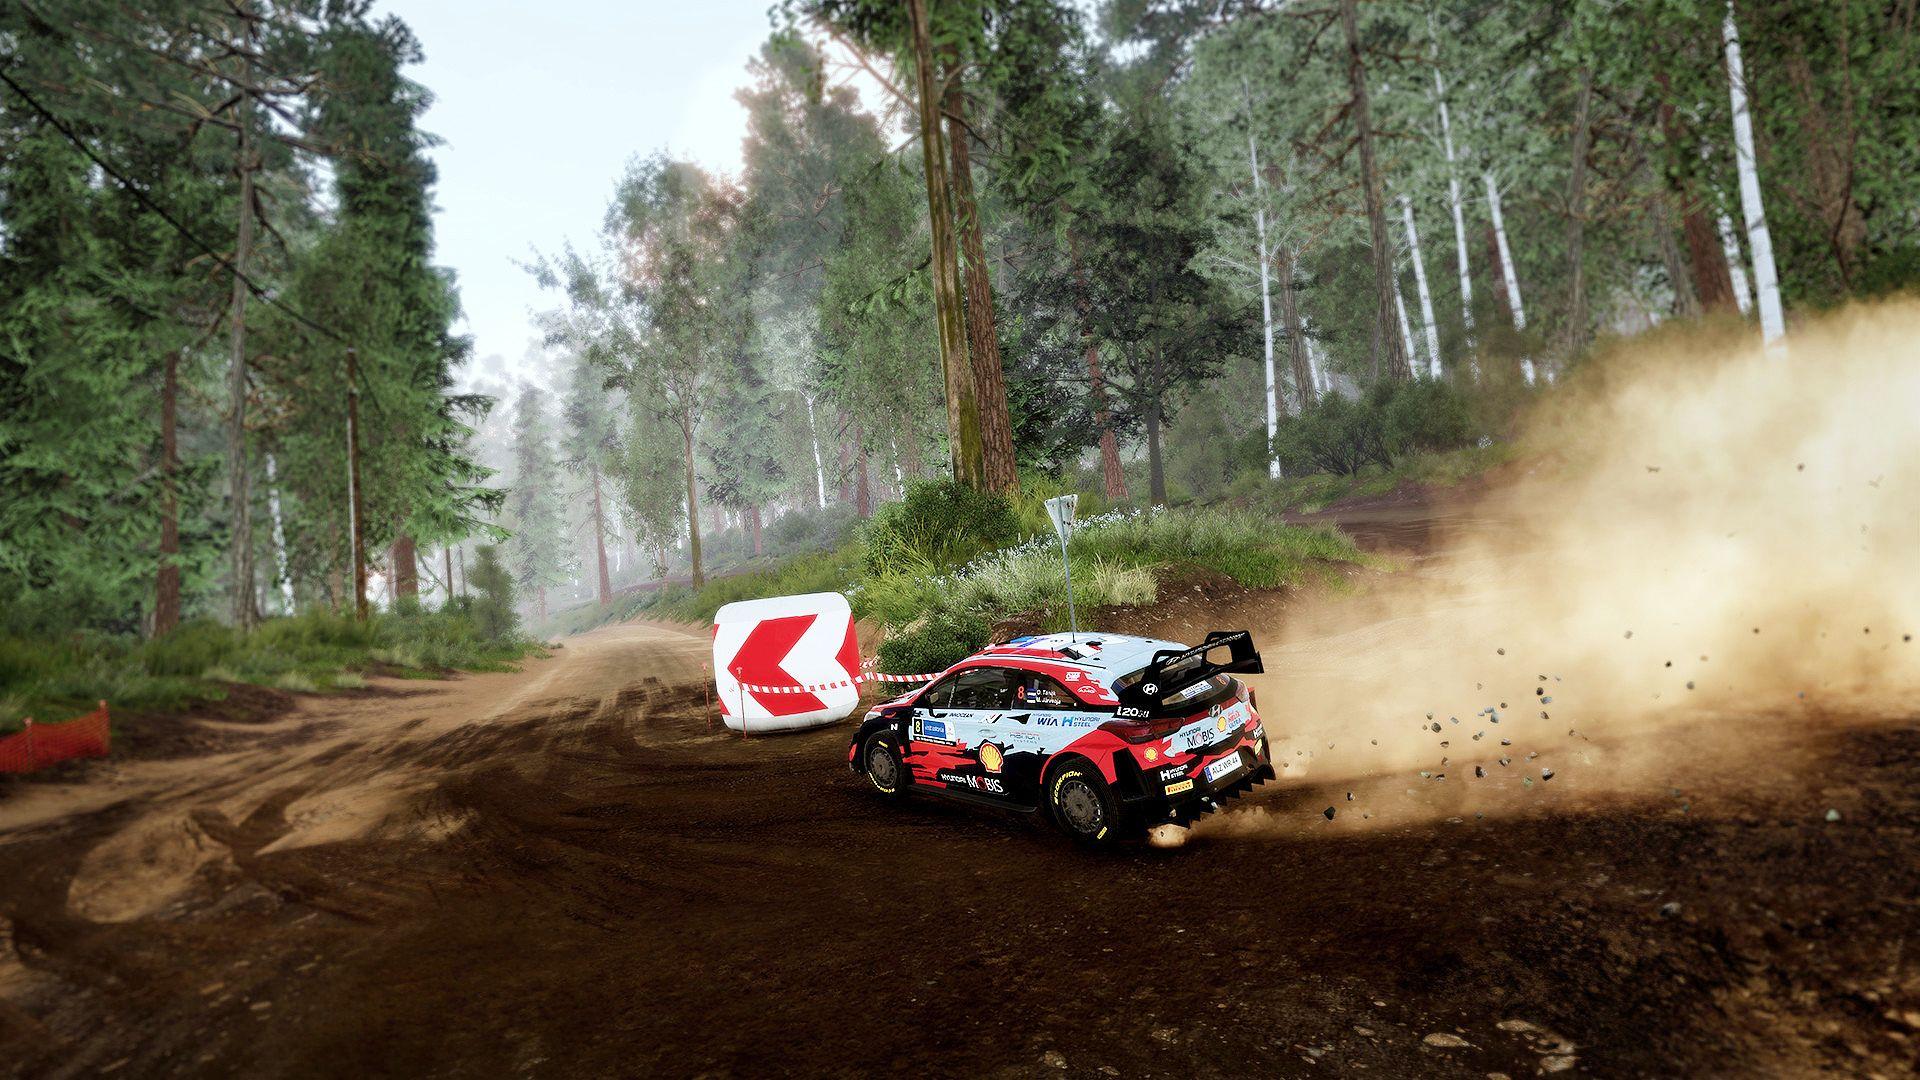 WRC 10 is Forza Horizon for masochists